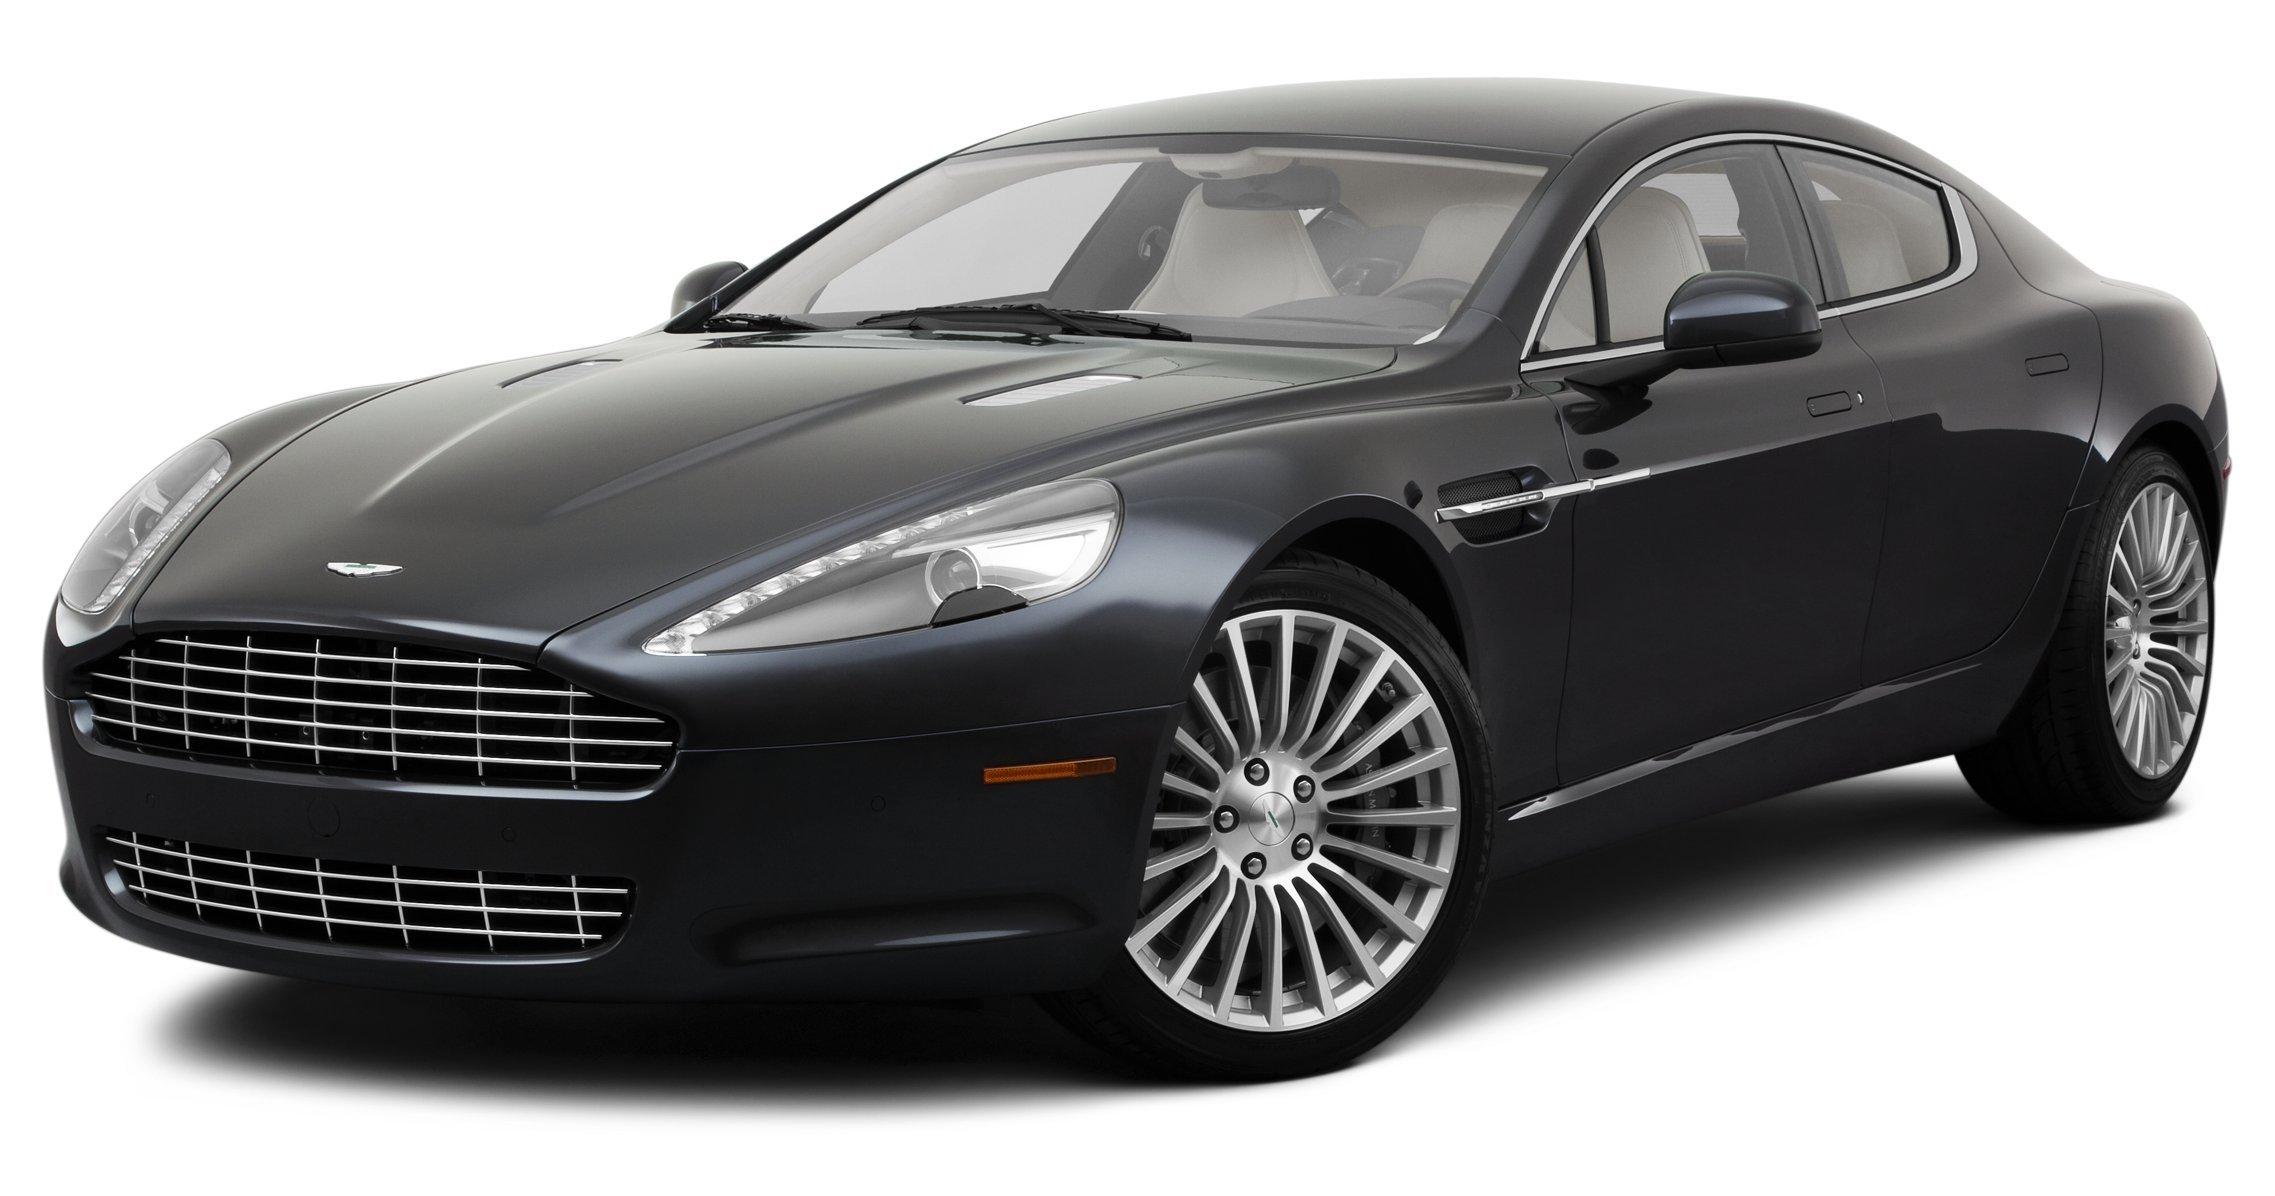 Amazoncom Aston Martin Rapide Reviews Images And Specs - Aston martin 4 door